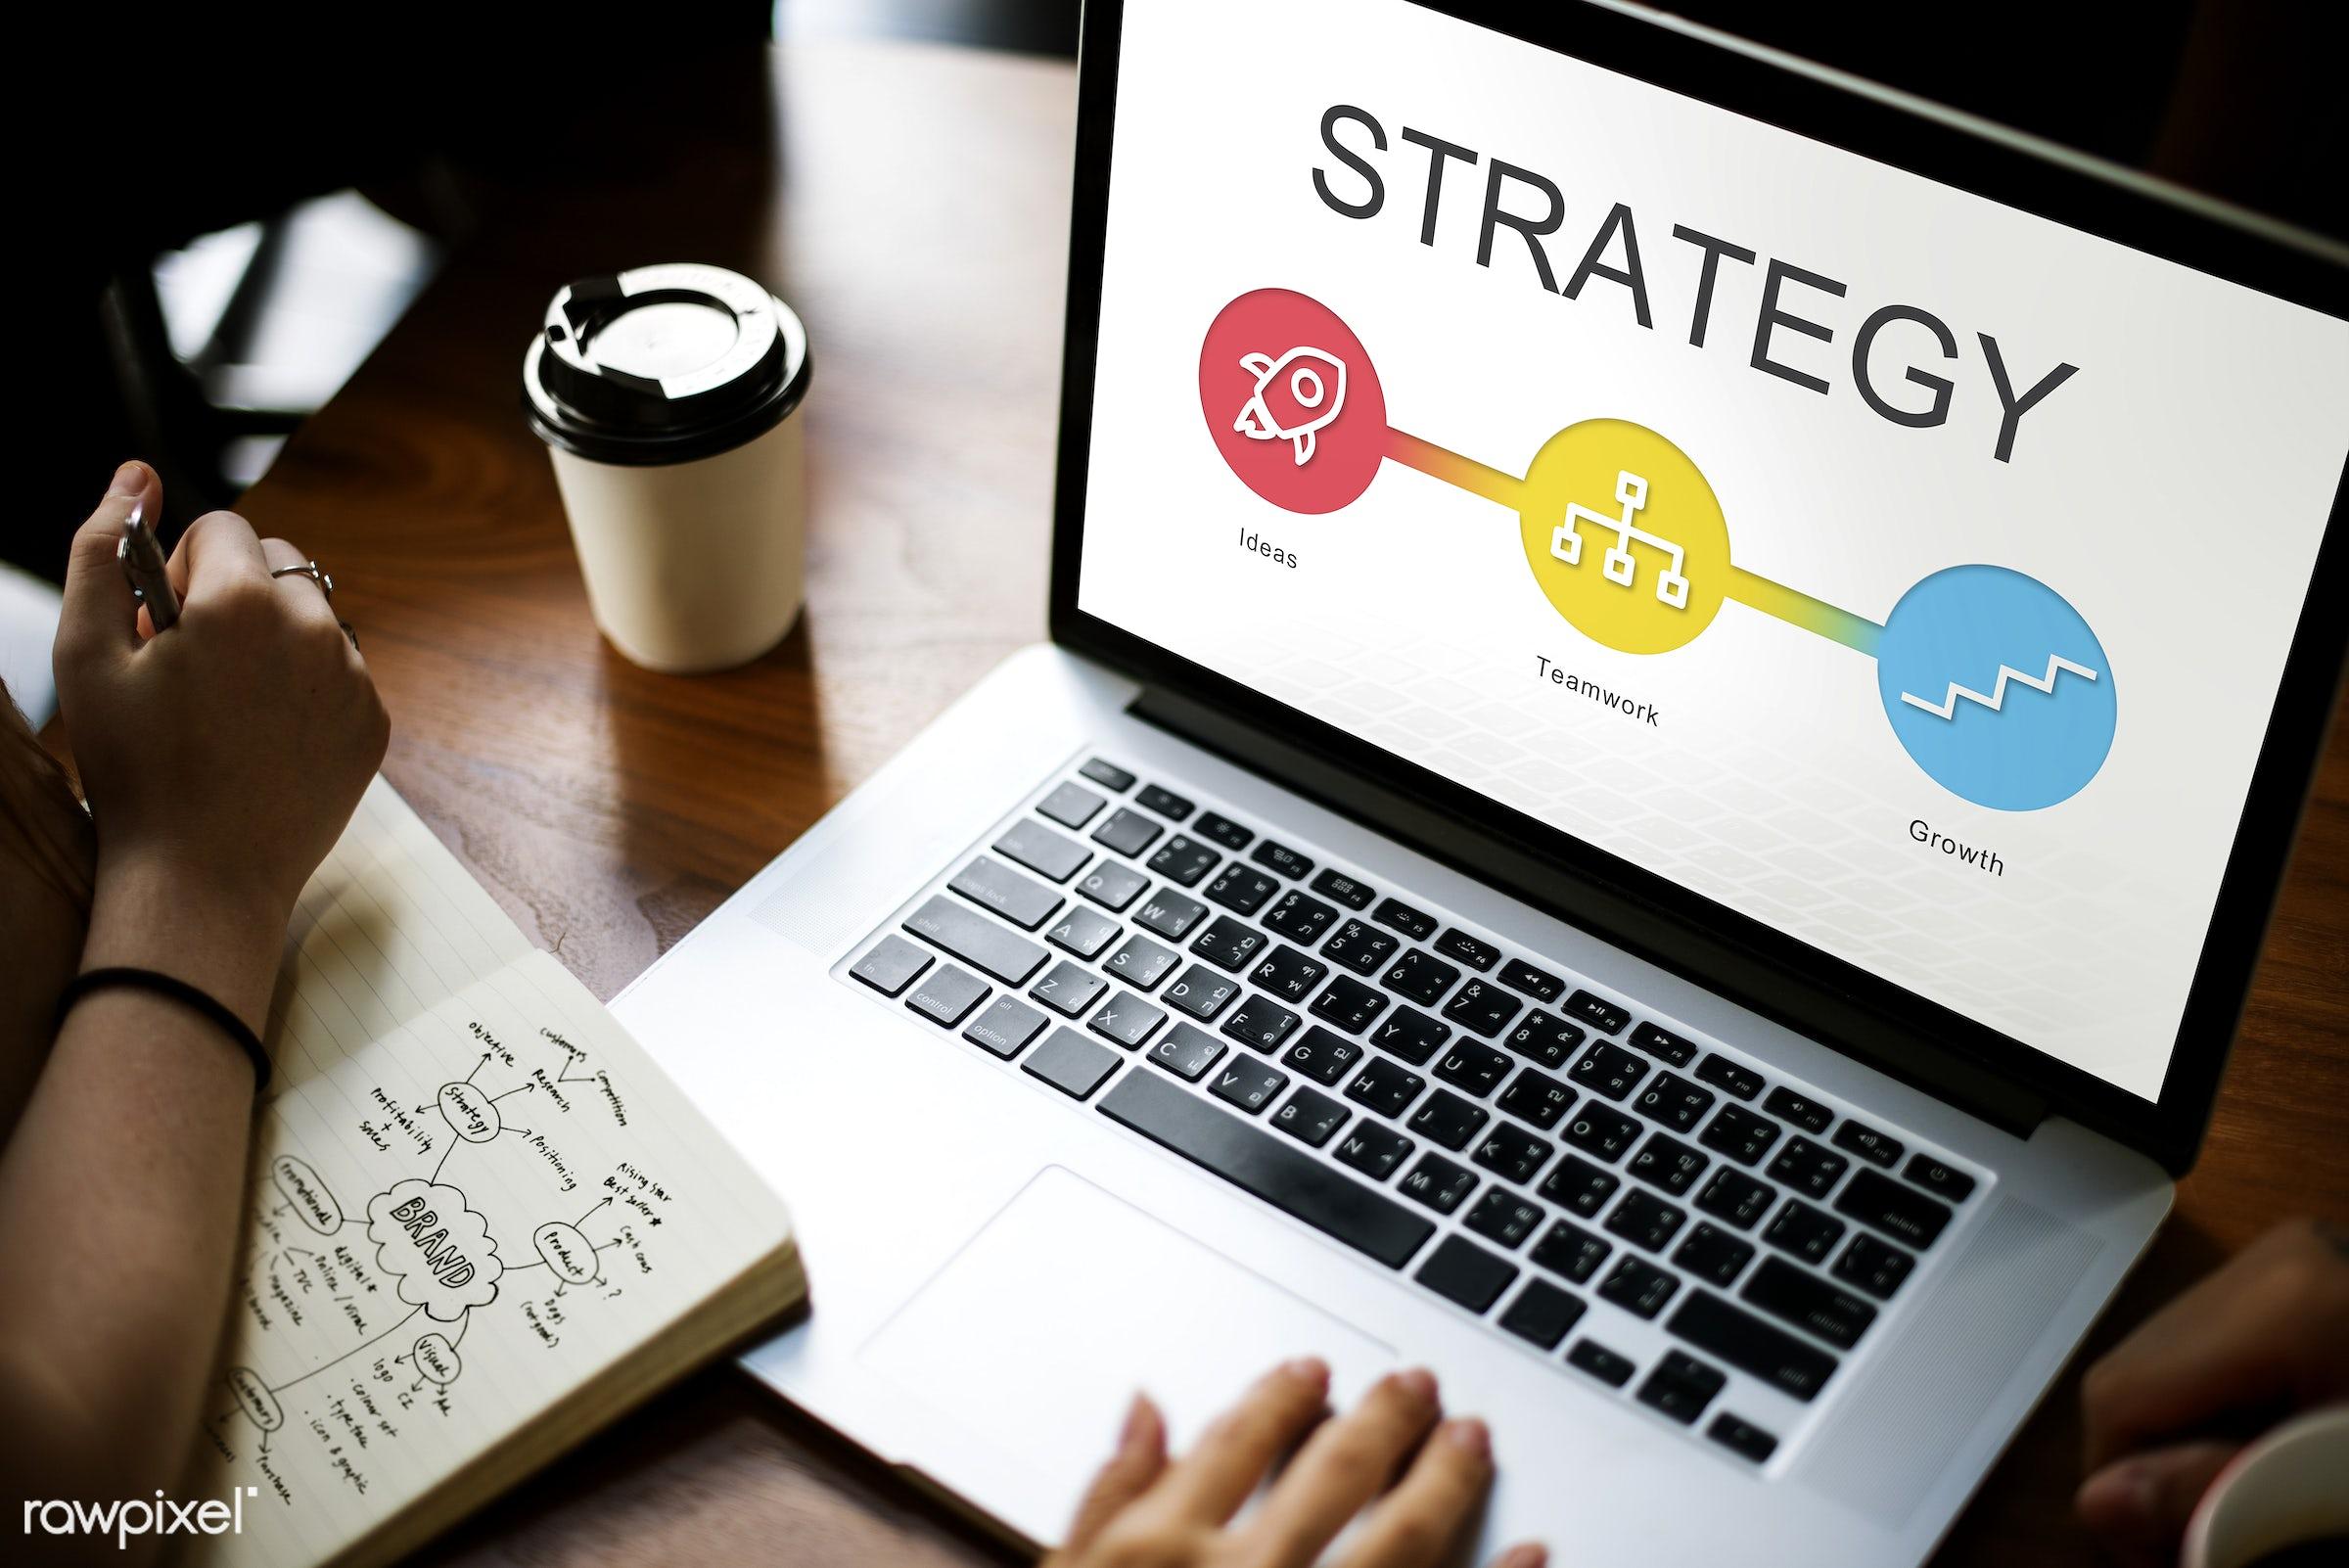 achievement, browsing, business, coffee cup, development, device, diagram, digital, digital device, goal, growth, hands,...